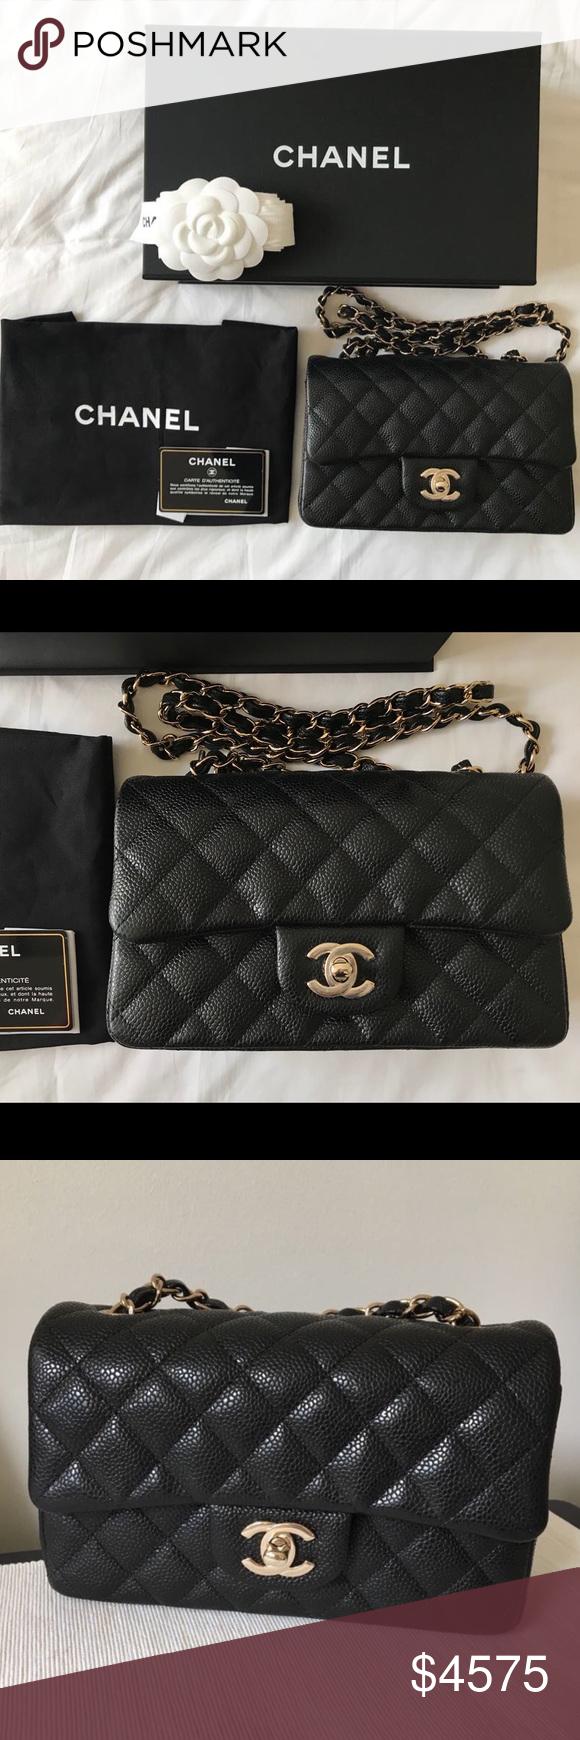 2ebd94b74491 CHANEL Classic Rectangular Mini Flap Bag 18s CHANEL 18S Collection  Rectangular Mini Classic Flap Bag in